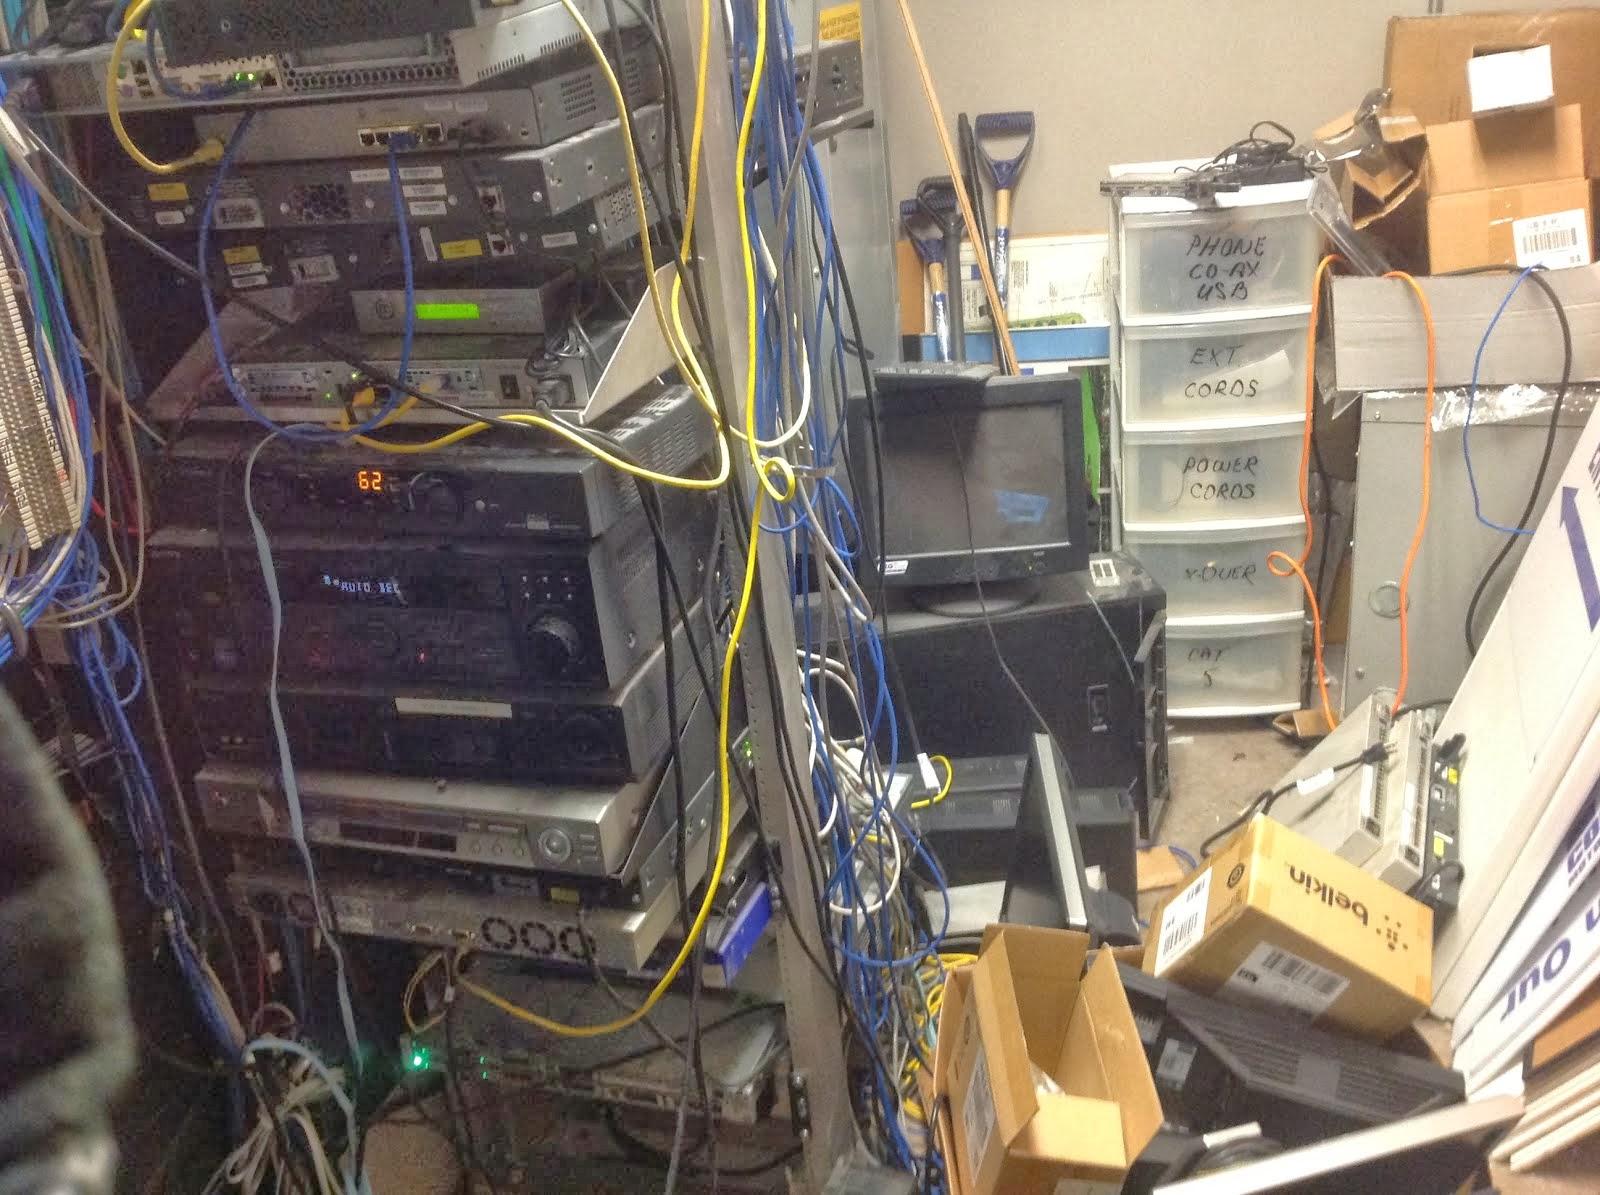 Network Advisor: March 2014